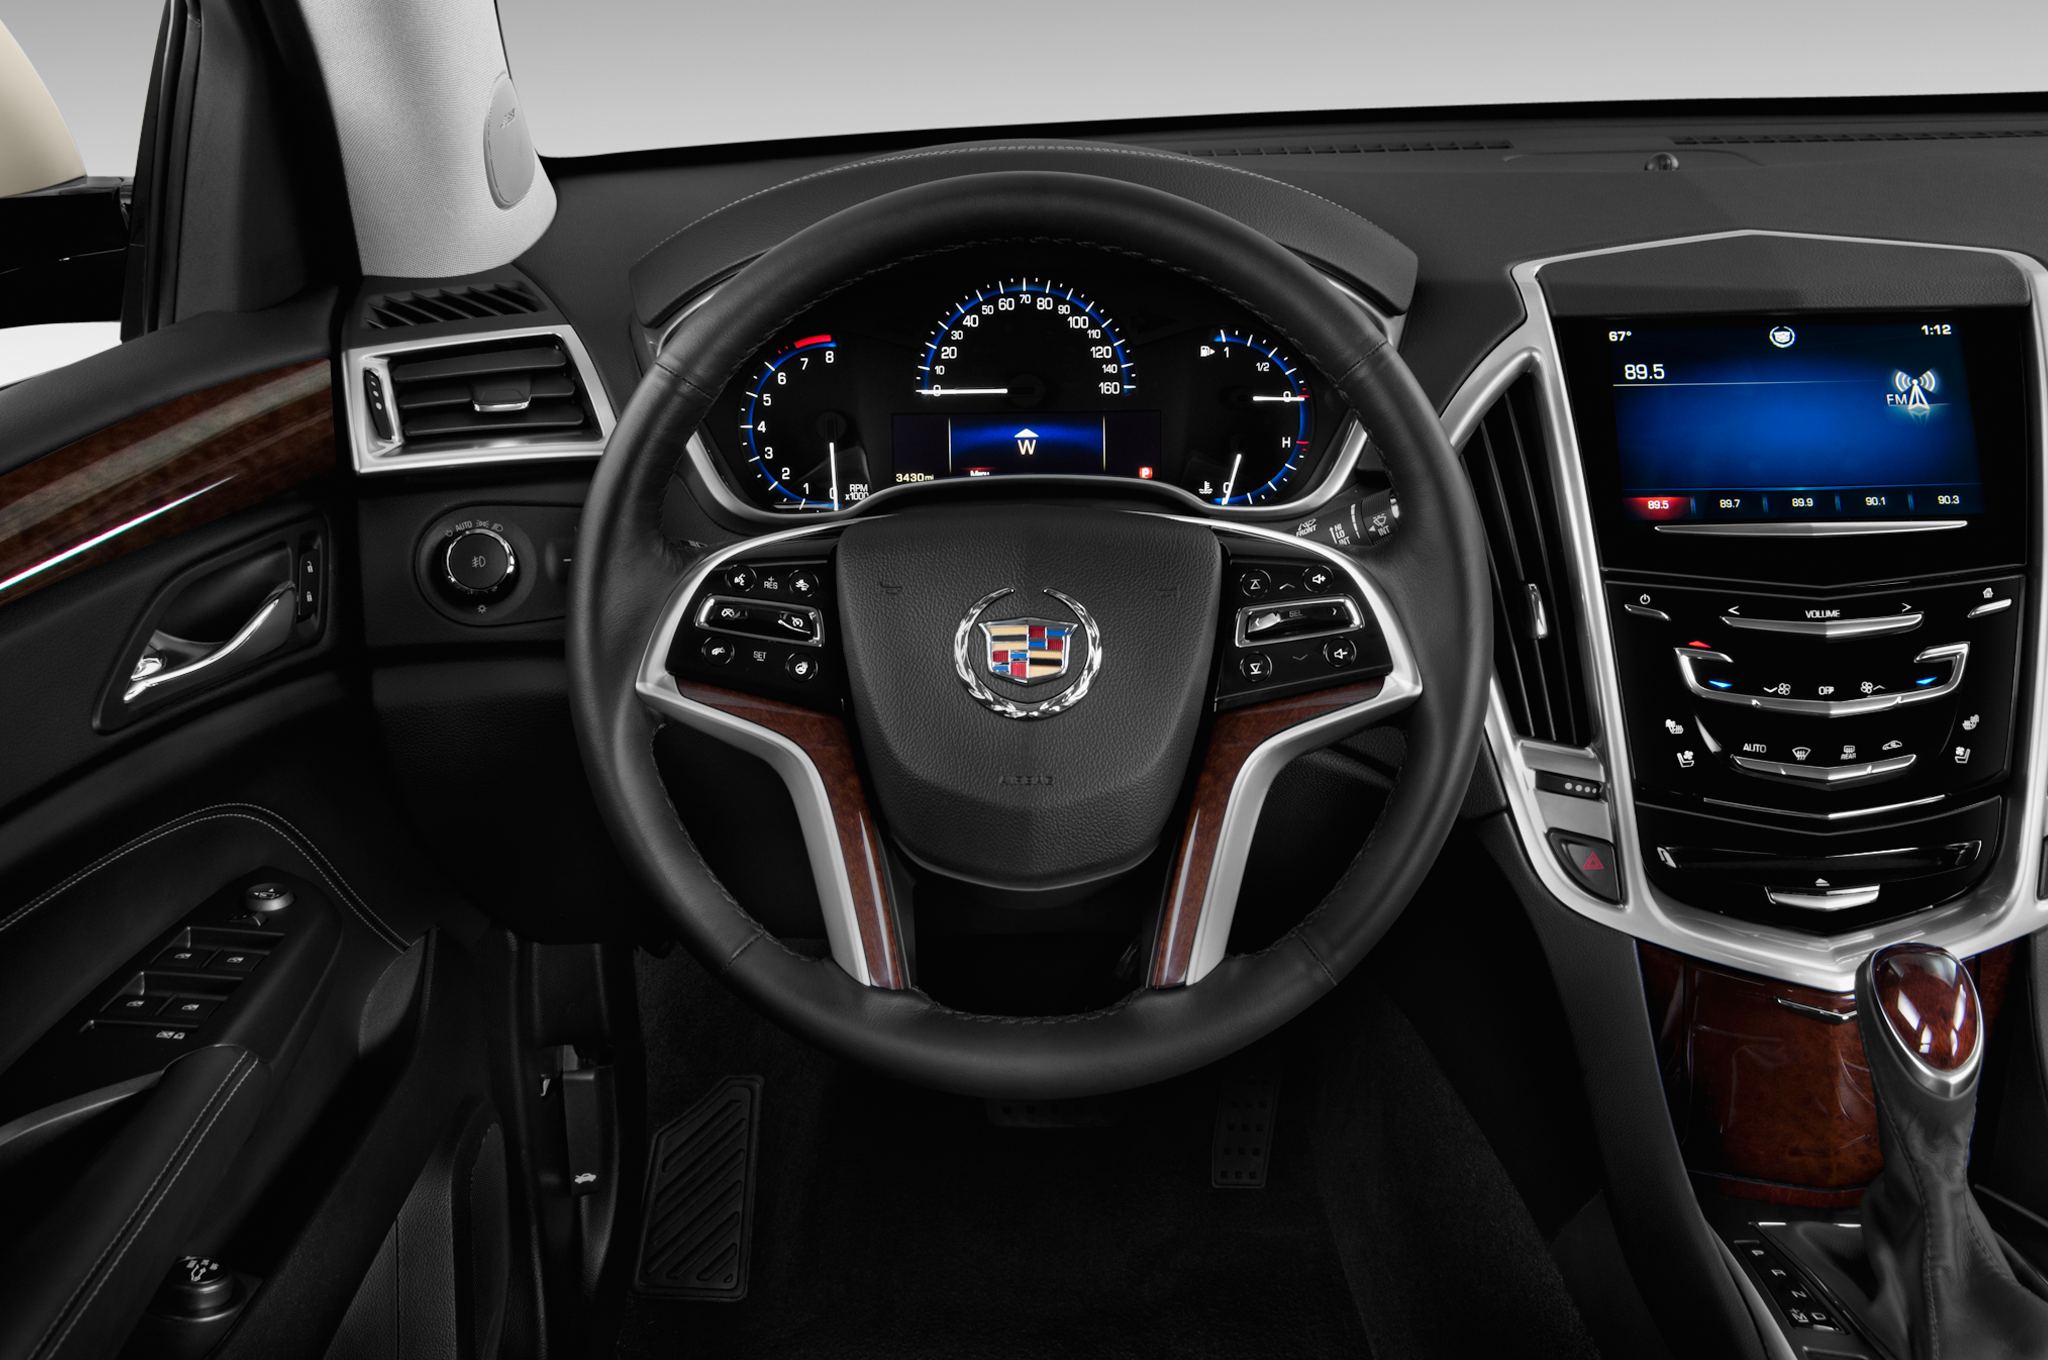 2007 Cadillac SRX: Finally, A New Interior! - Latest Auto Car News - Automobile Magazine